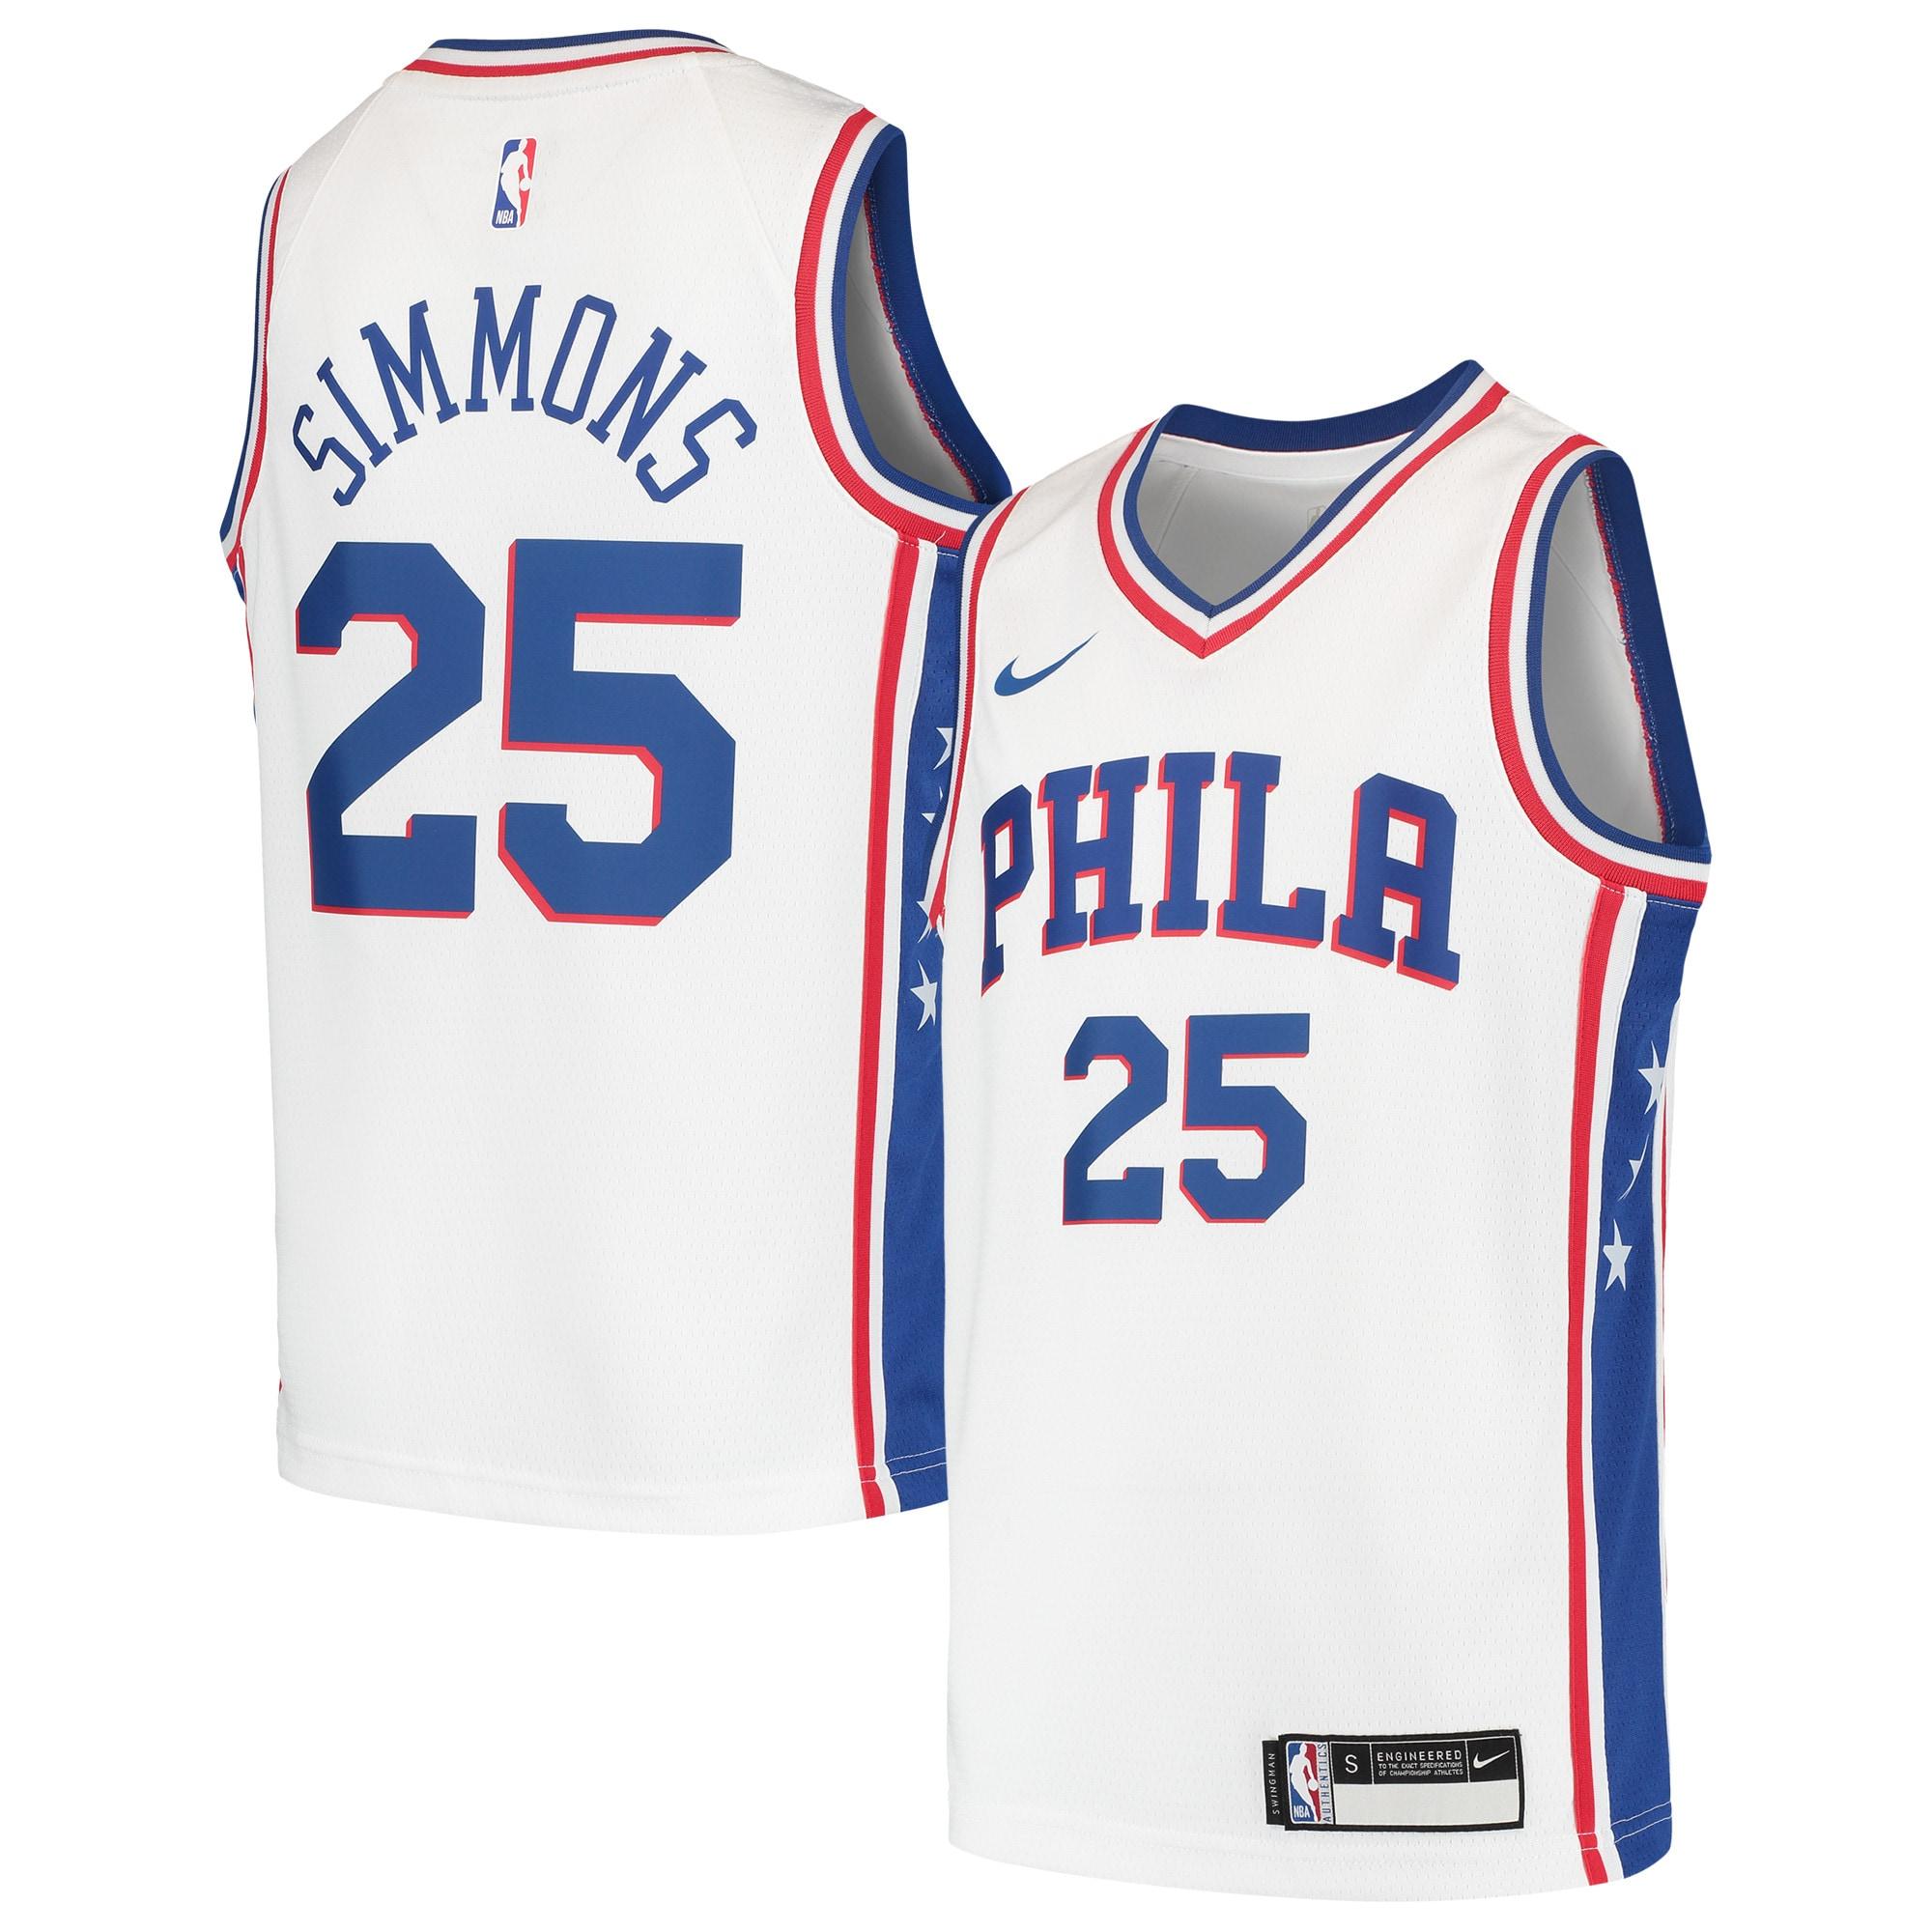 Ben Simmons Philadelphia 76ers Nike Youth Swingman Jersey - White